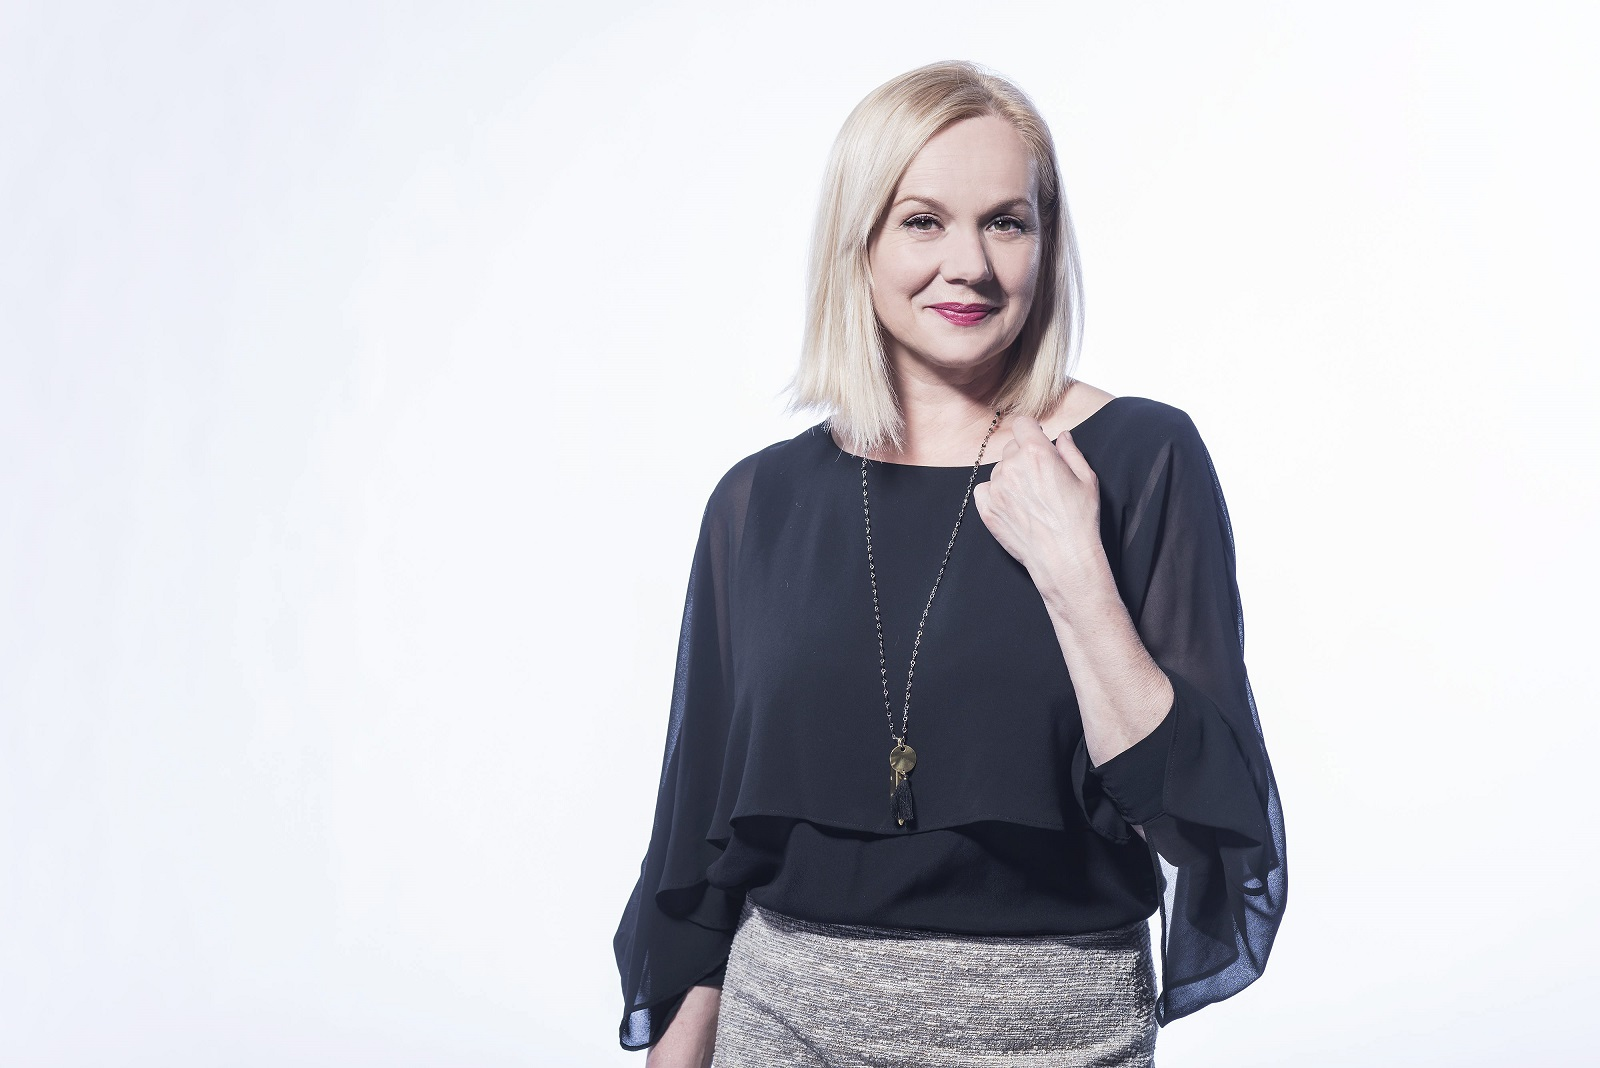 Zagreb, 140417.  Televizijska i kazalisna glumica Ksenija Pajic. Foto: Neja Markicevic / CROPIX